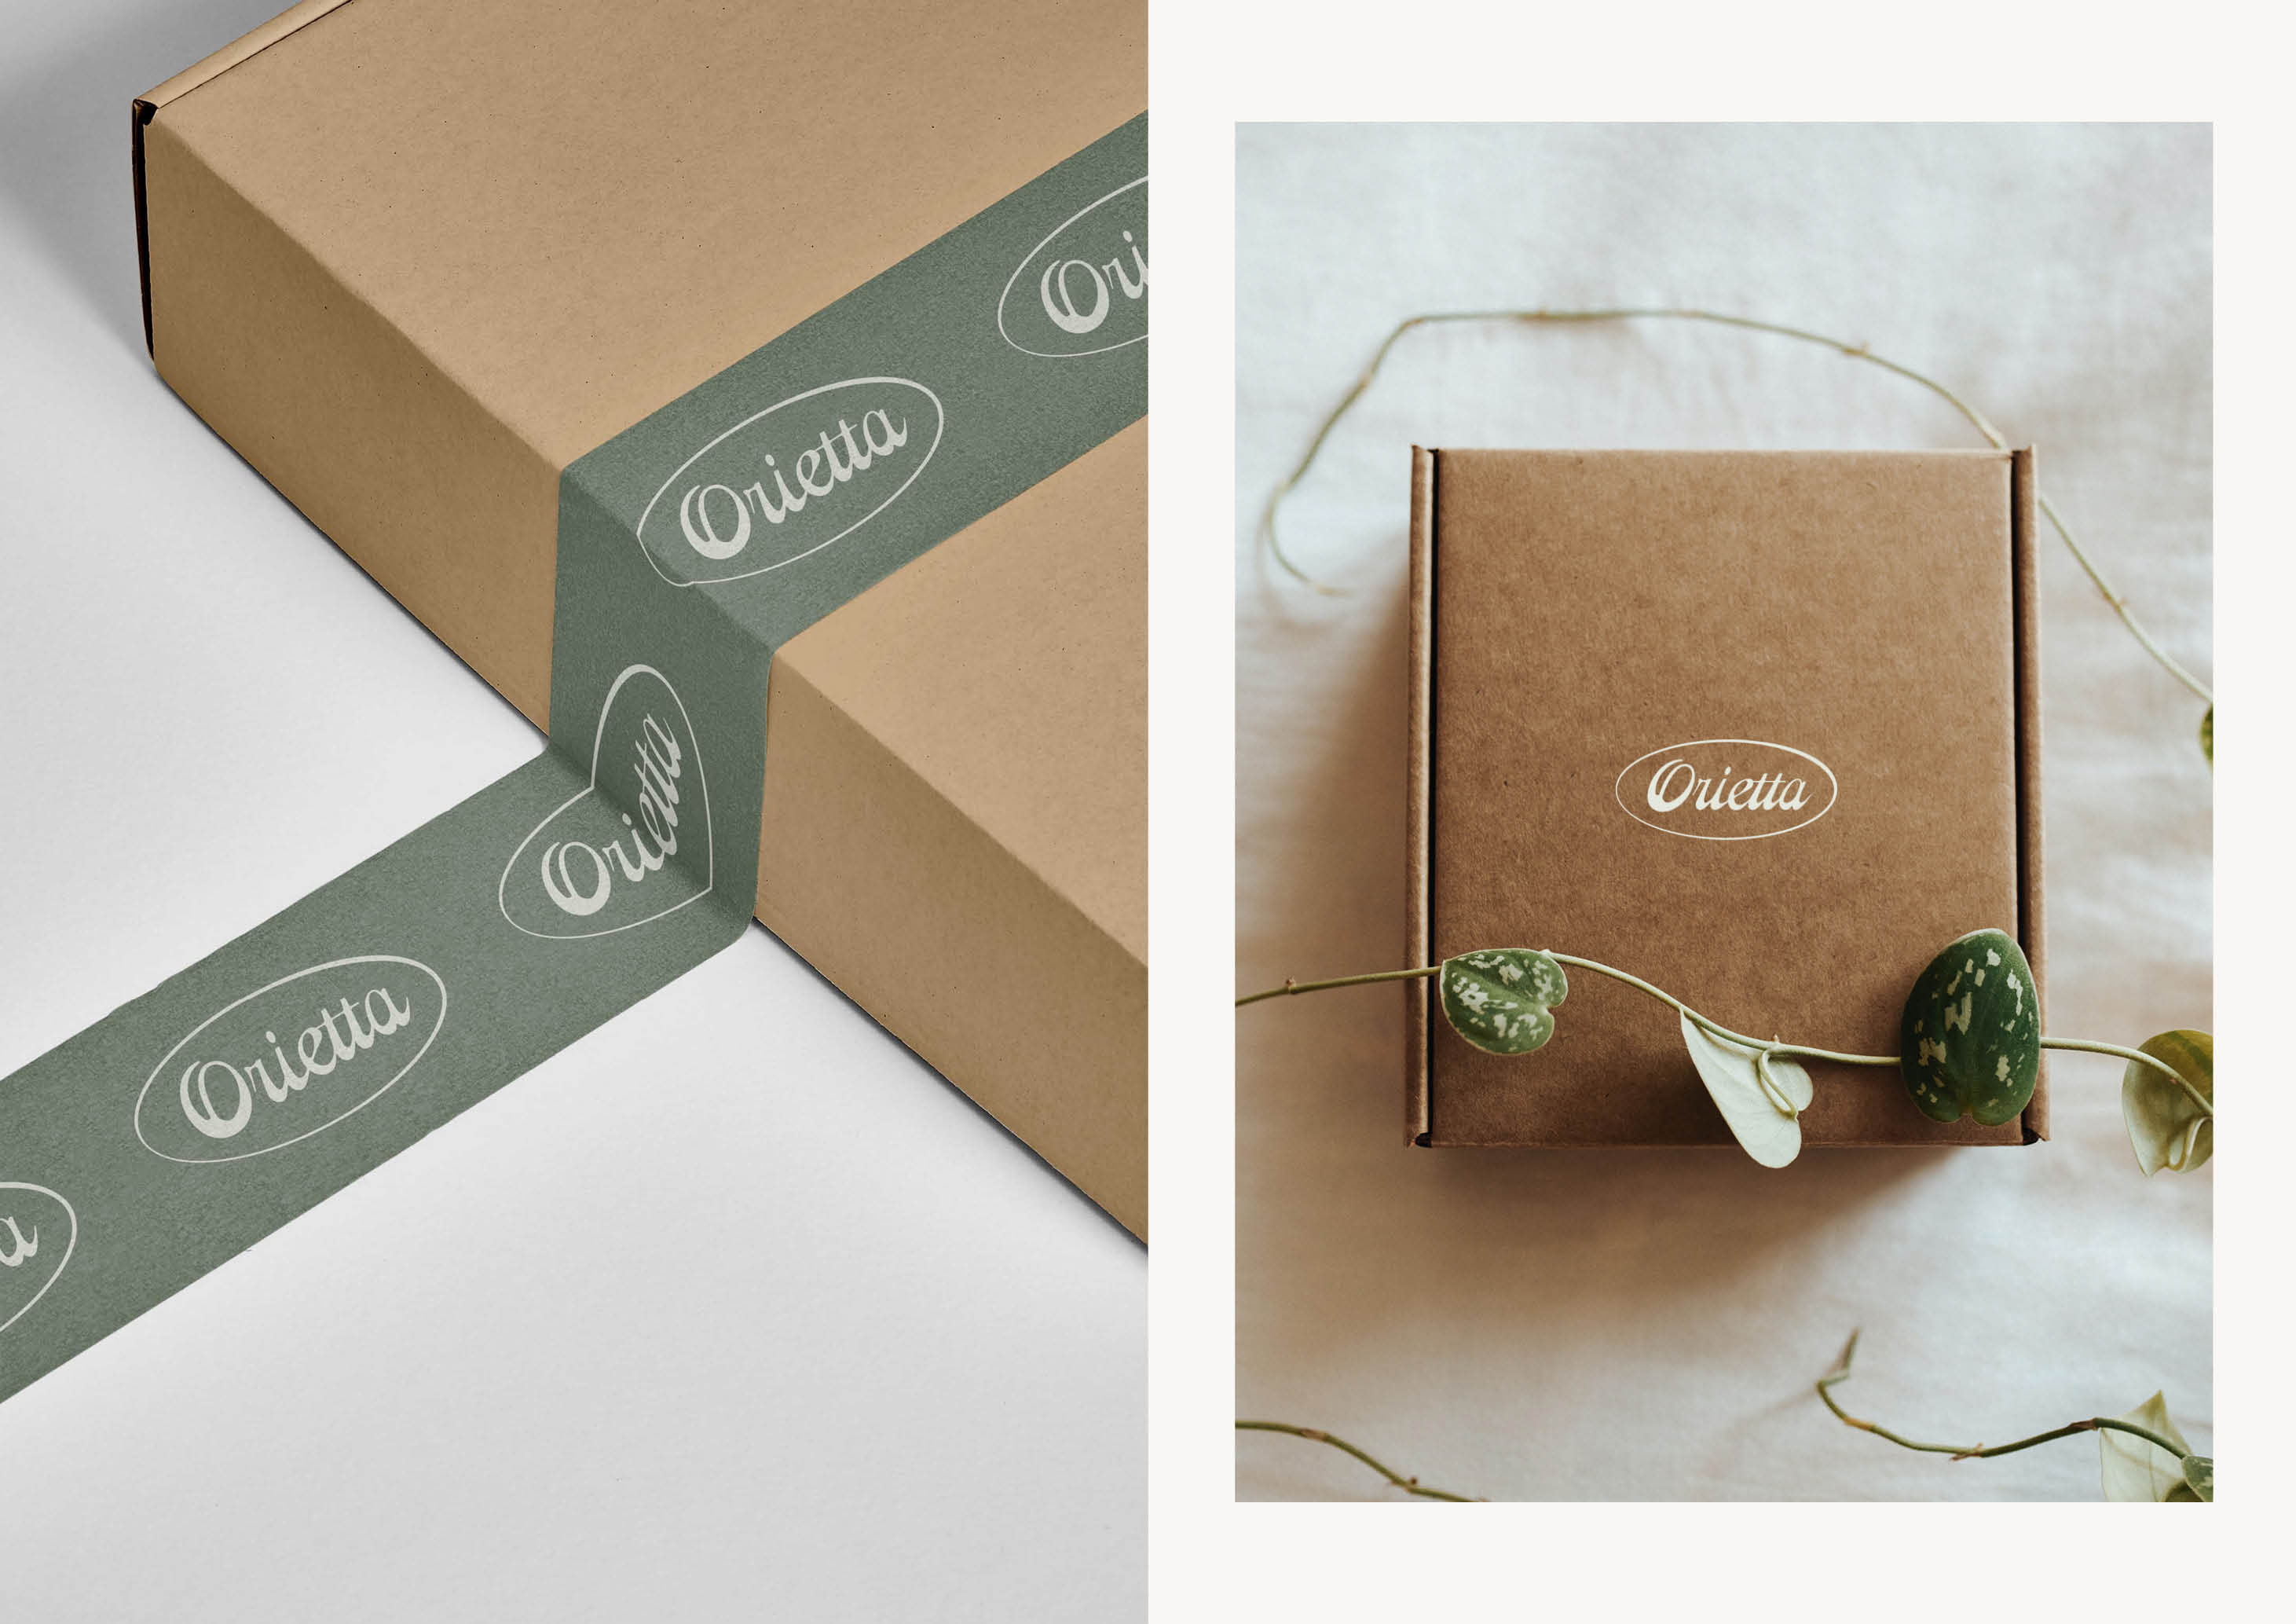 Orietta (Chile) brand identity by Magdalena Weiss